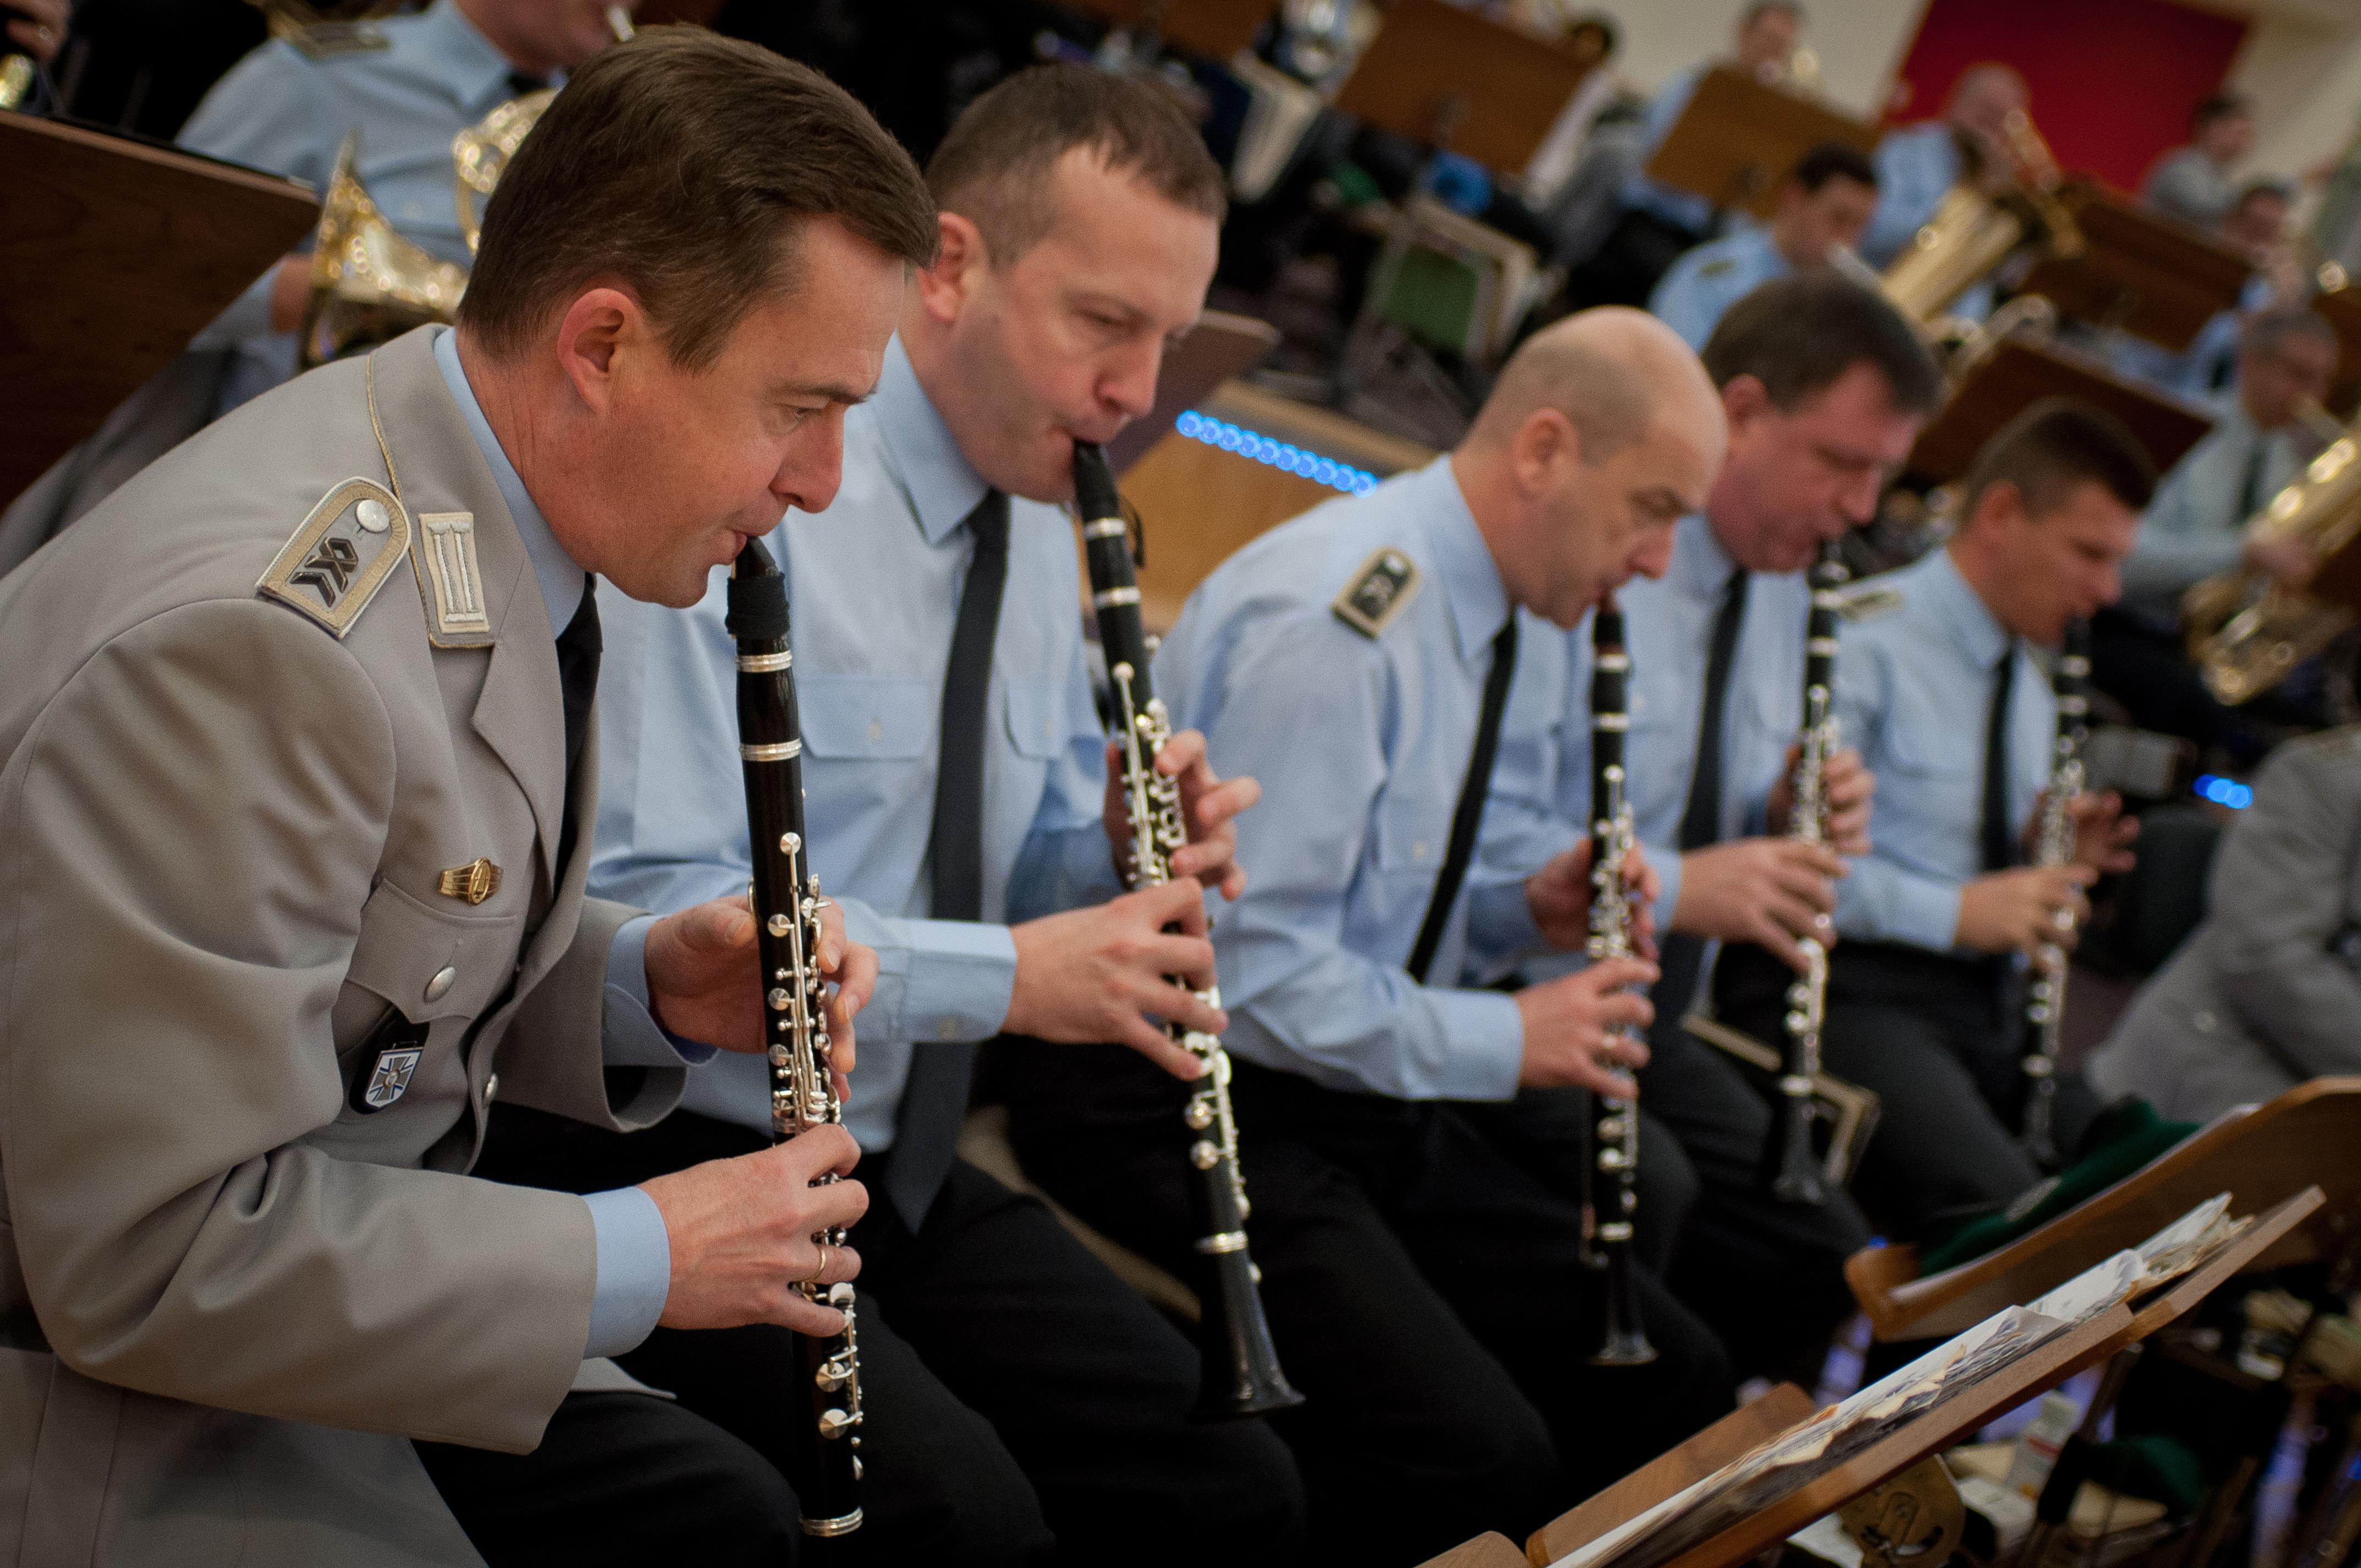 stabsmusikkorps-bundeswehr